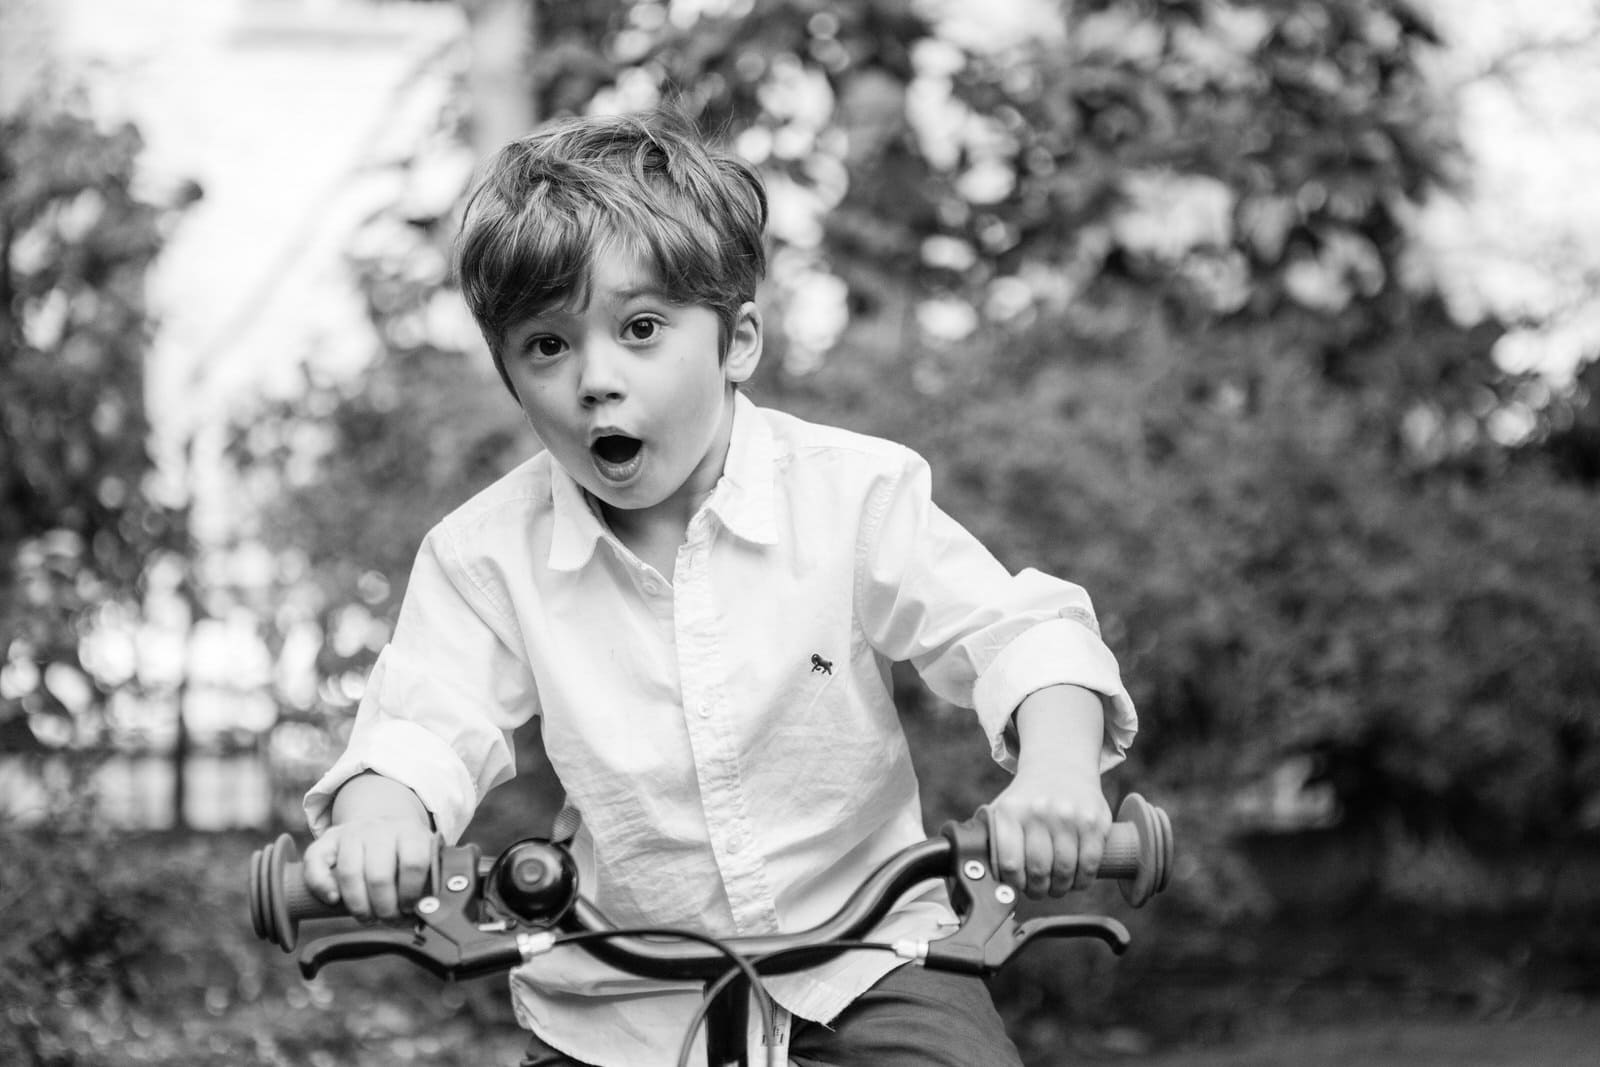 kensington-day-in-the-life-documentary-family-photographs-0138